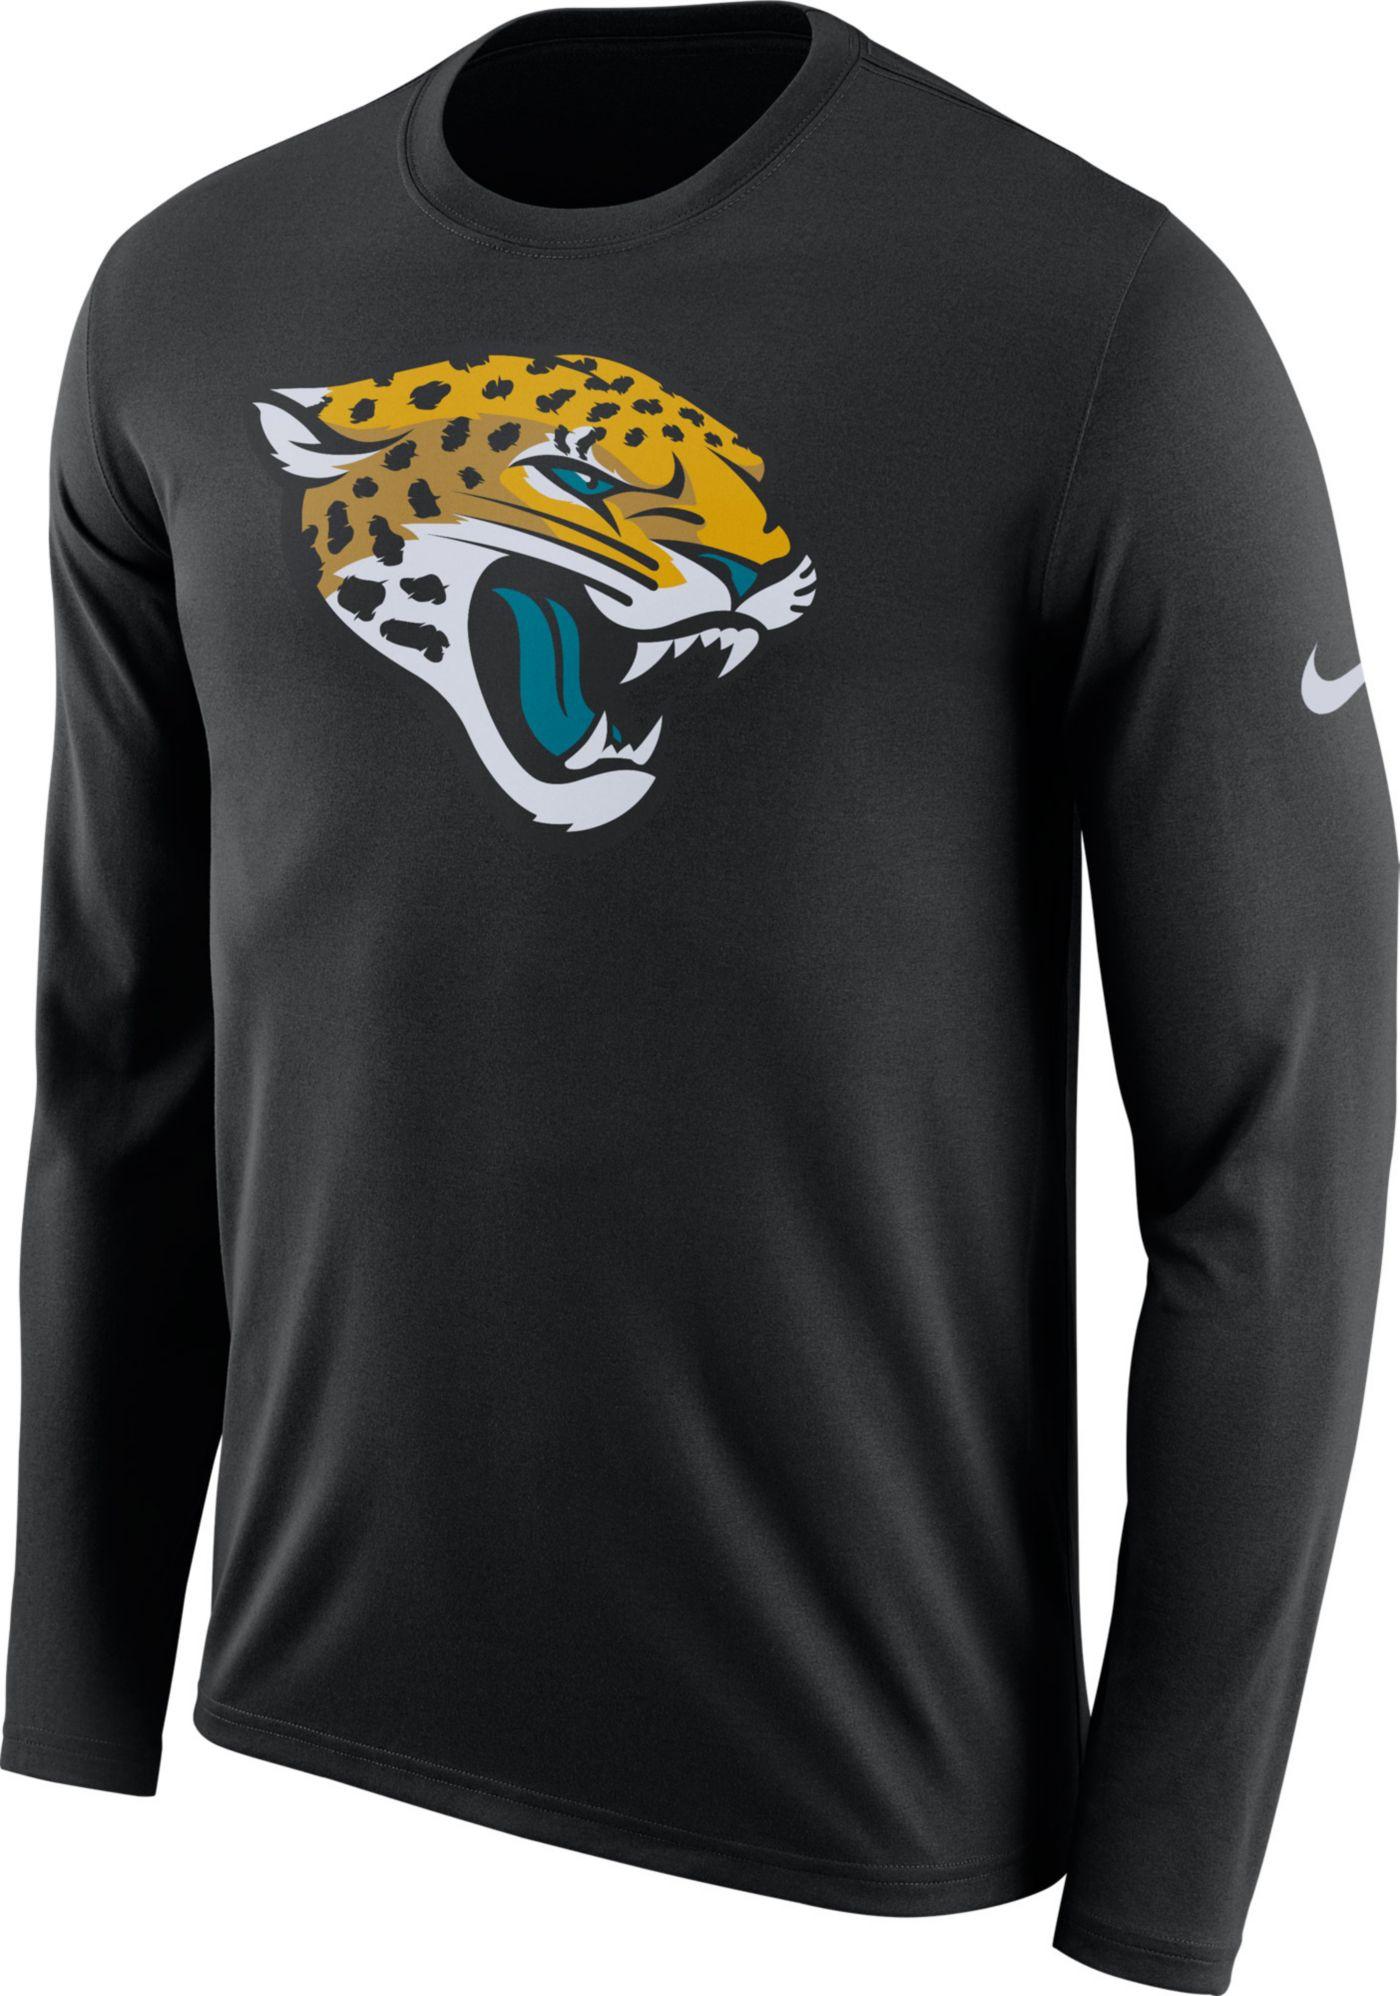 Nike Men's Jacksonville Jaguars Logo Black Long Sleeve Shirt